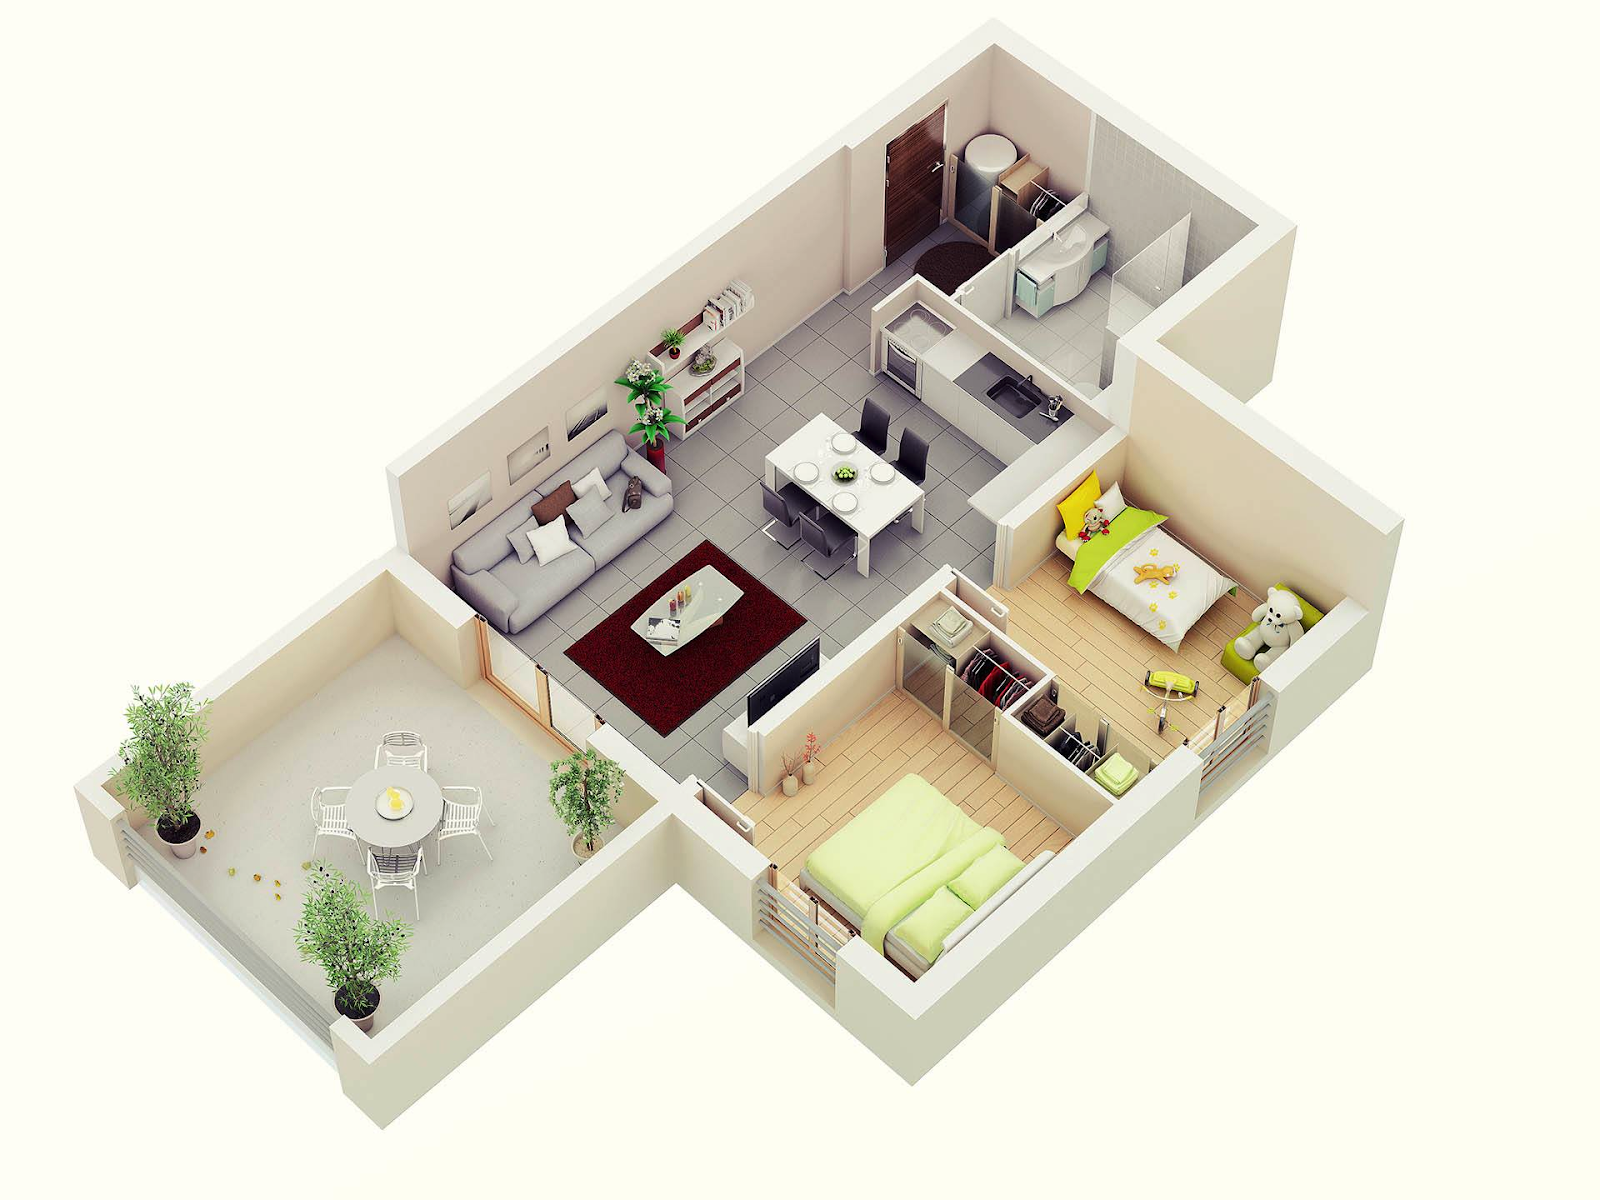 Stylish%2BModern%2BHome%2B3D%2BFloor%2BPlans%2B%25281%2529 Stylish Home 3D Floor Plans Interior